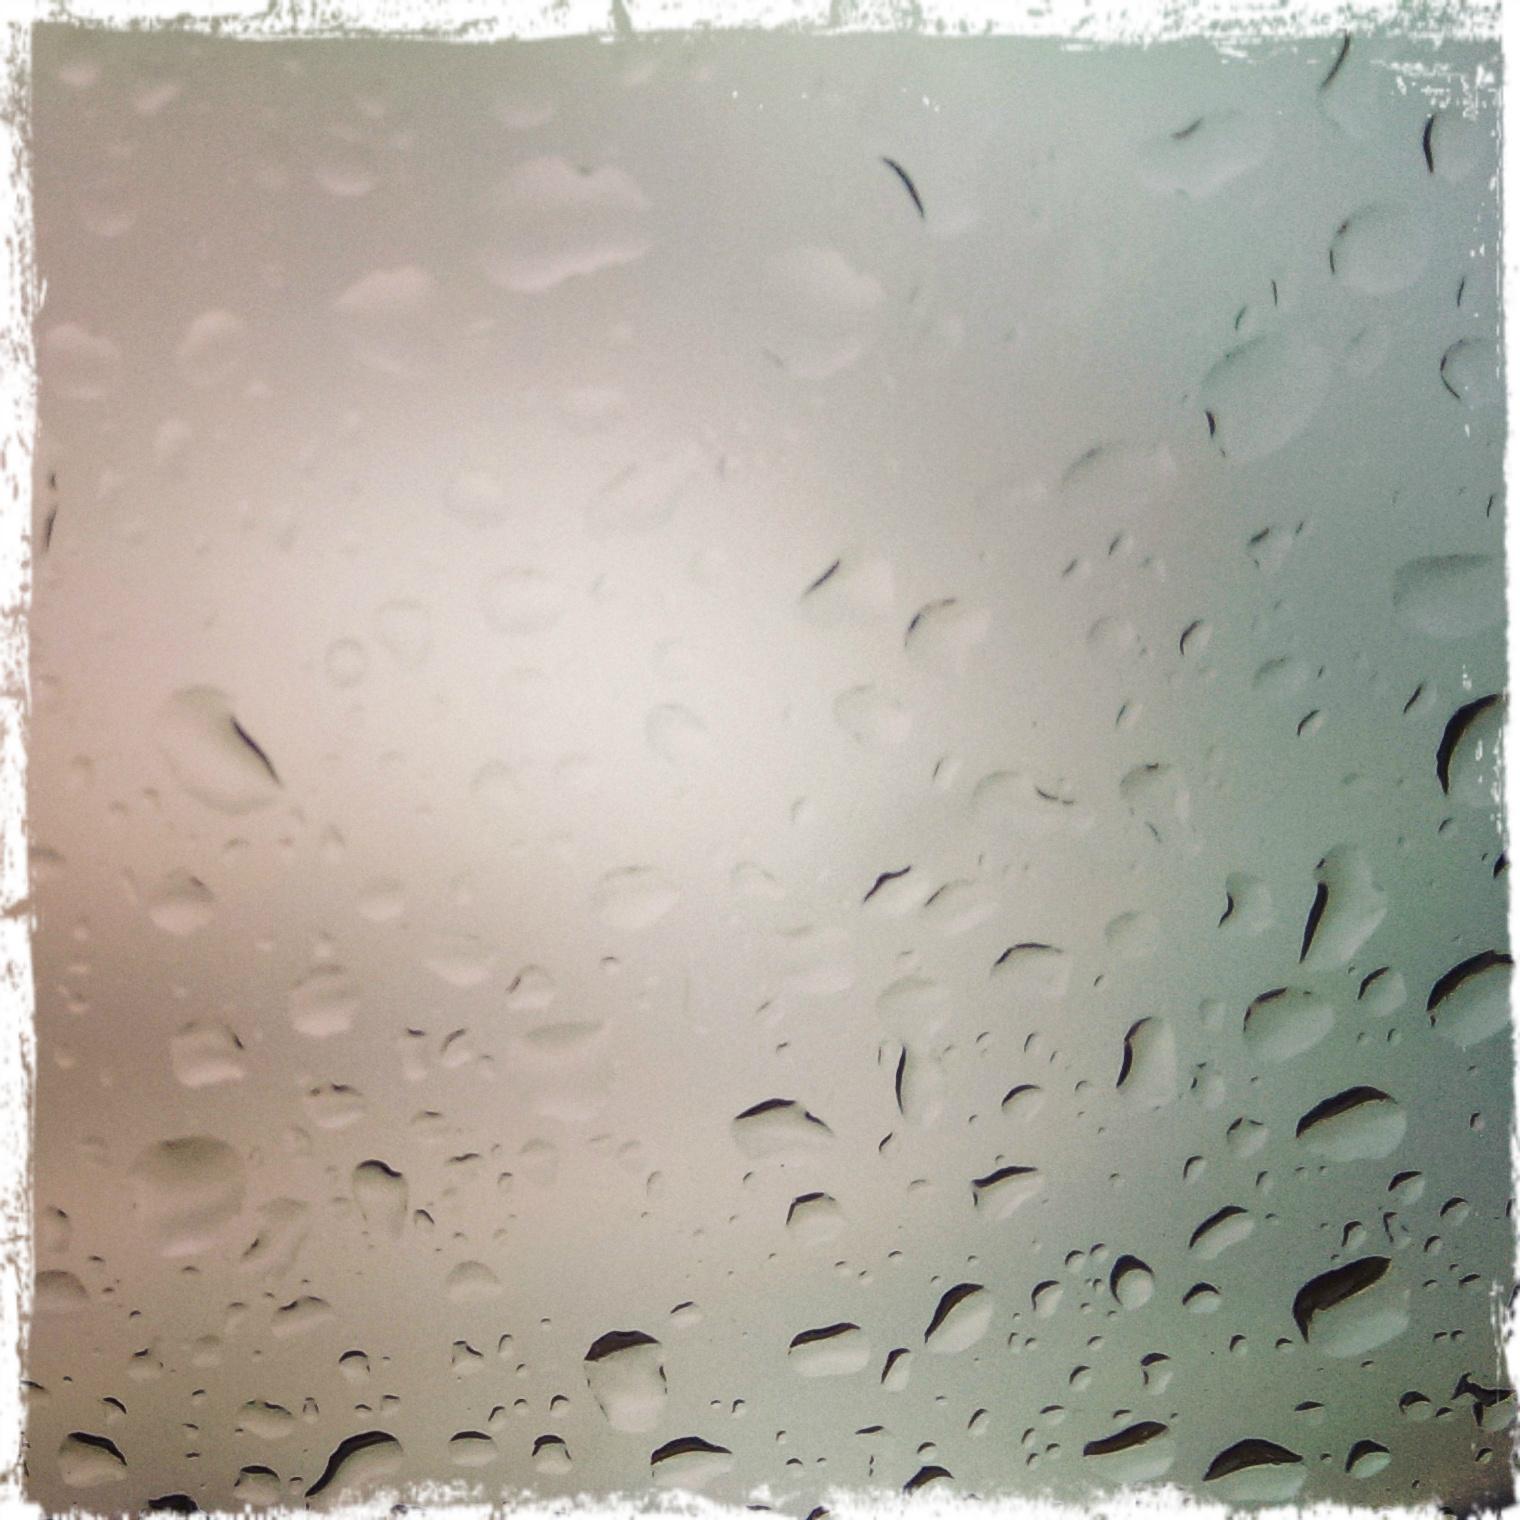 haiku poems about rain - photo #32